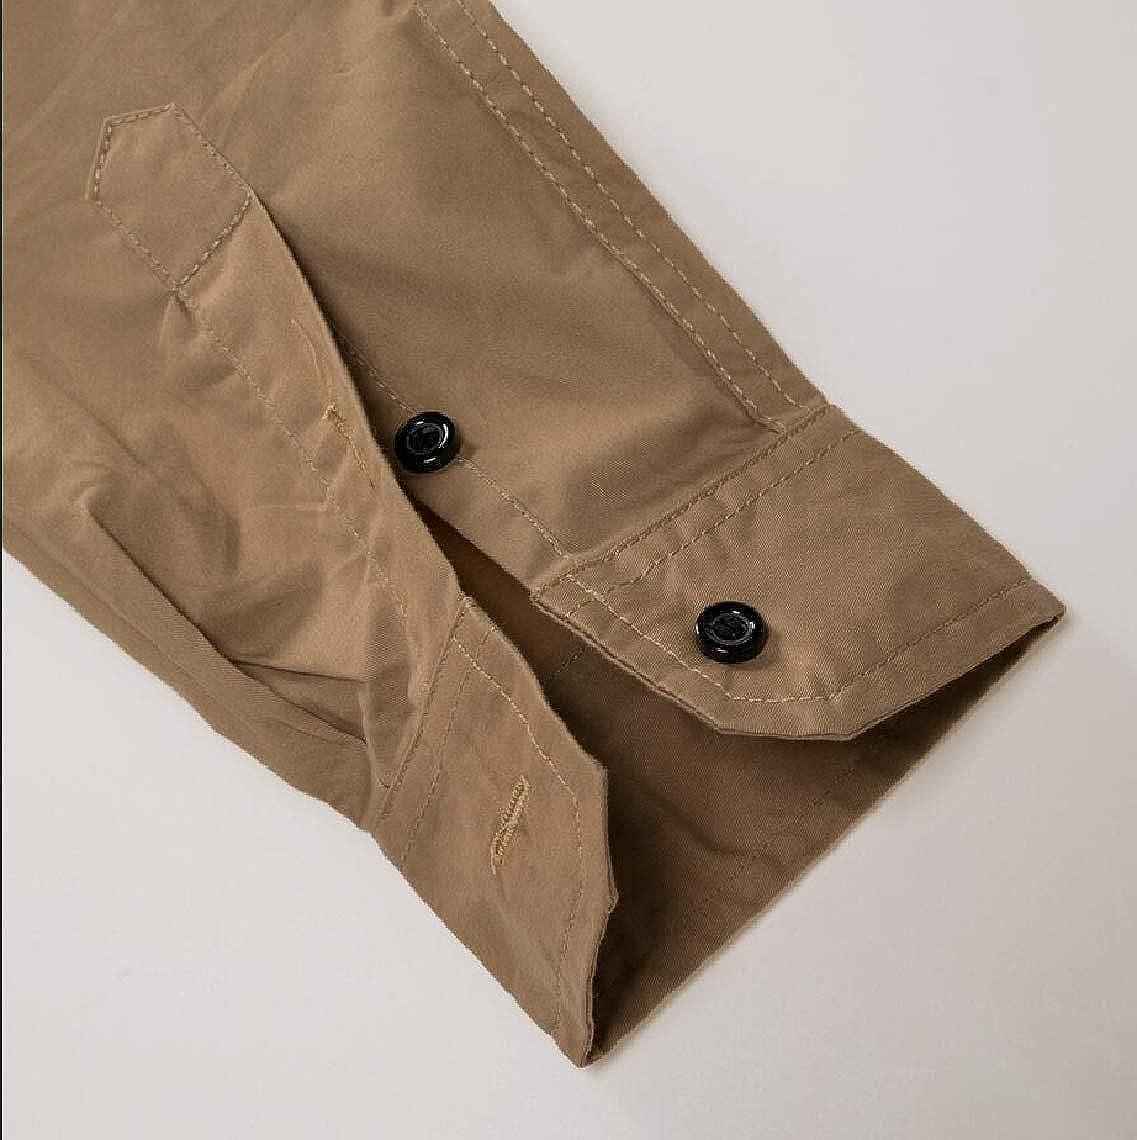 Keaac Mens Slim Fit Long Sleeve Button Down Shirts with Pocket Dress Shirts